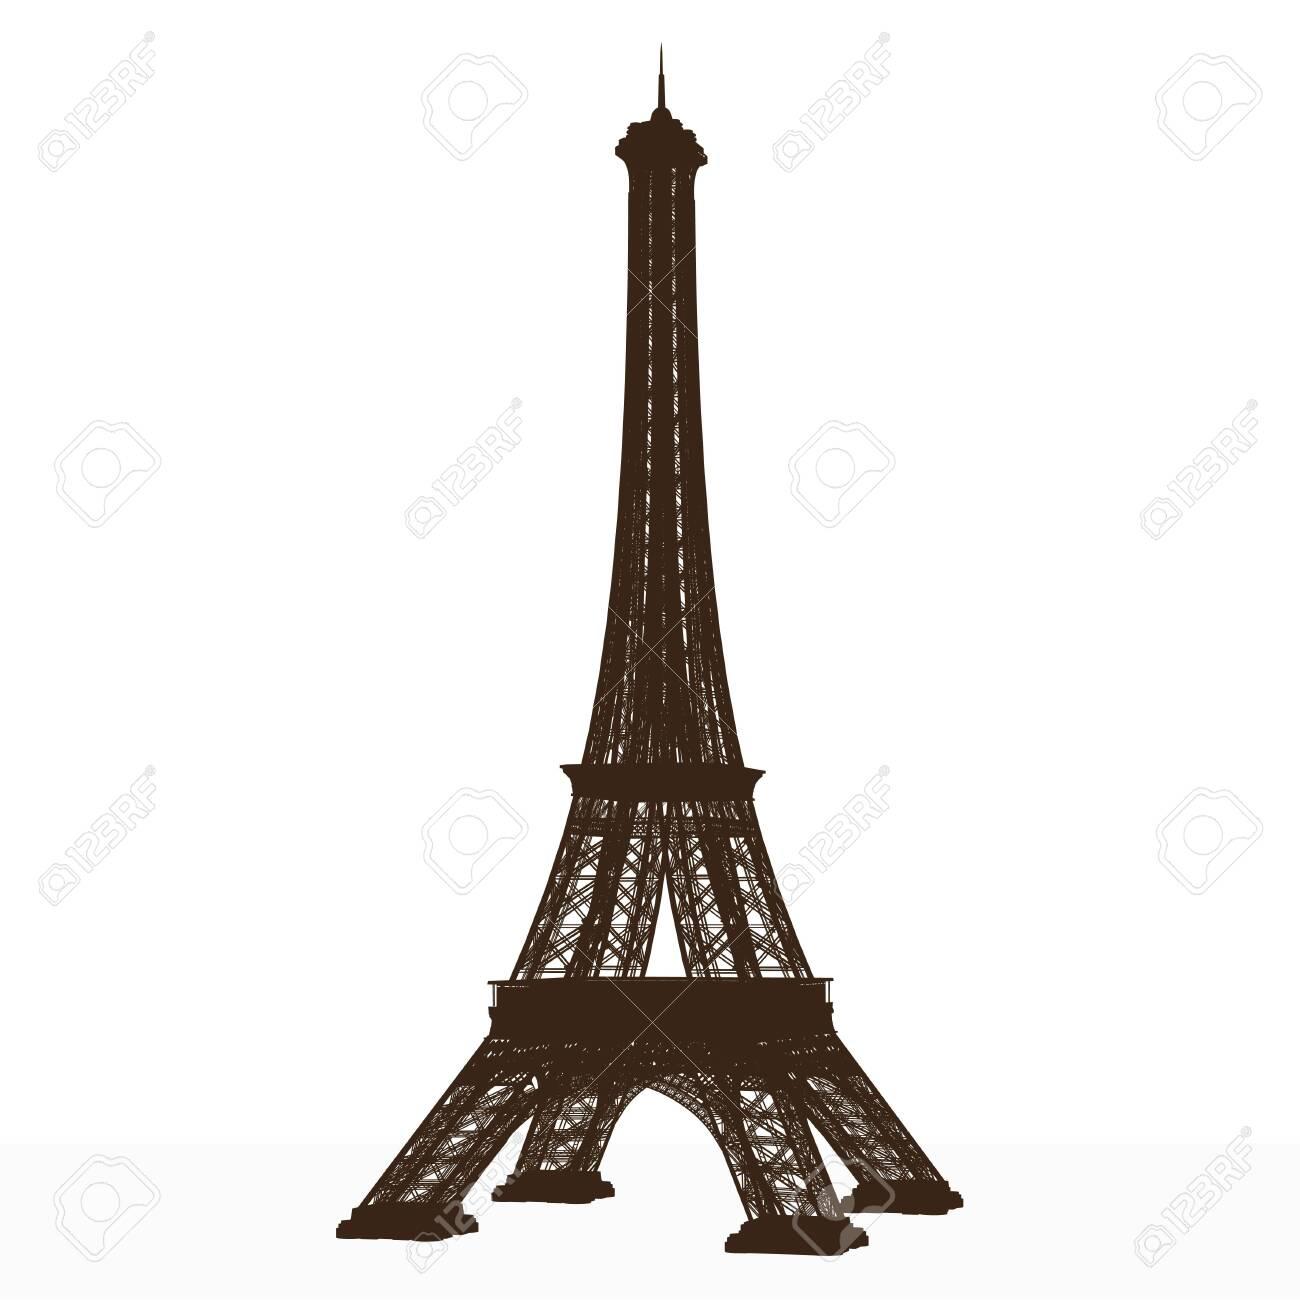 eiffel tower. detailed vector. - 149983186